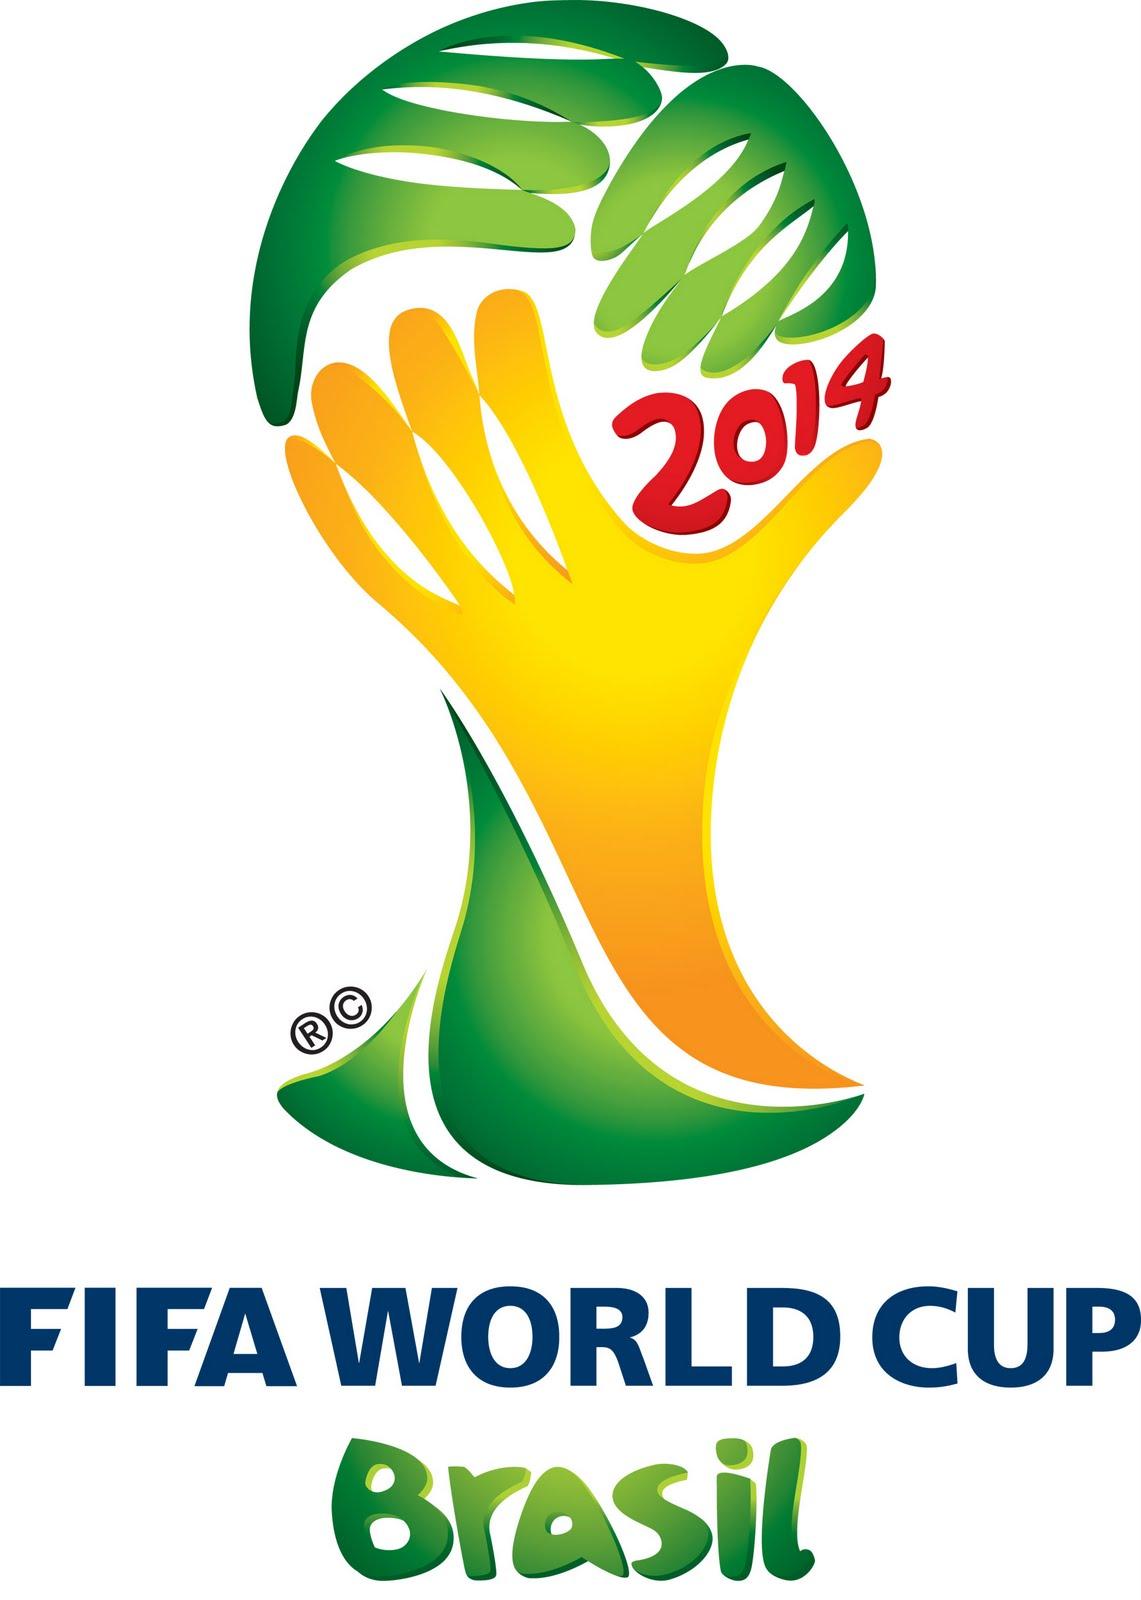 FIFA World Cup 2014 Brazil sports betting